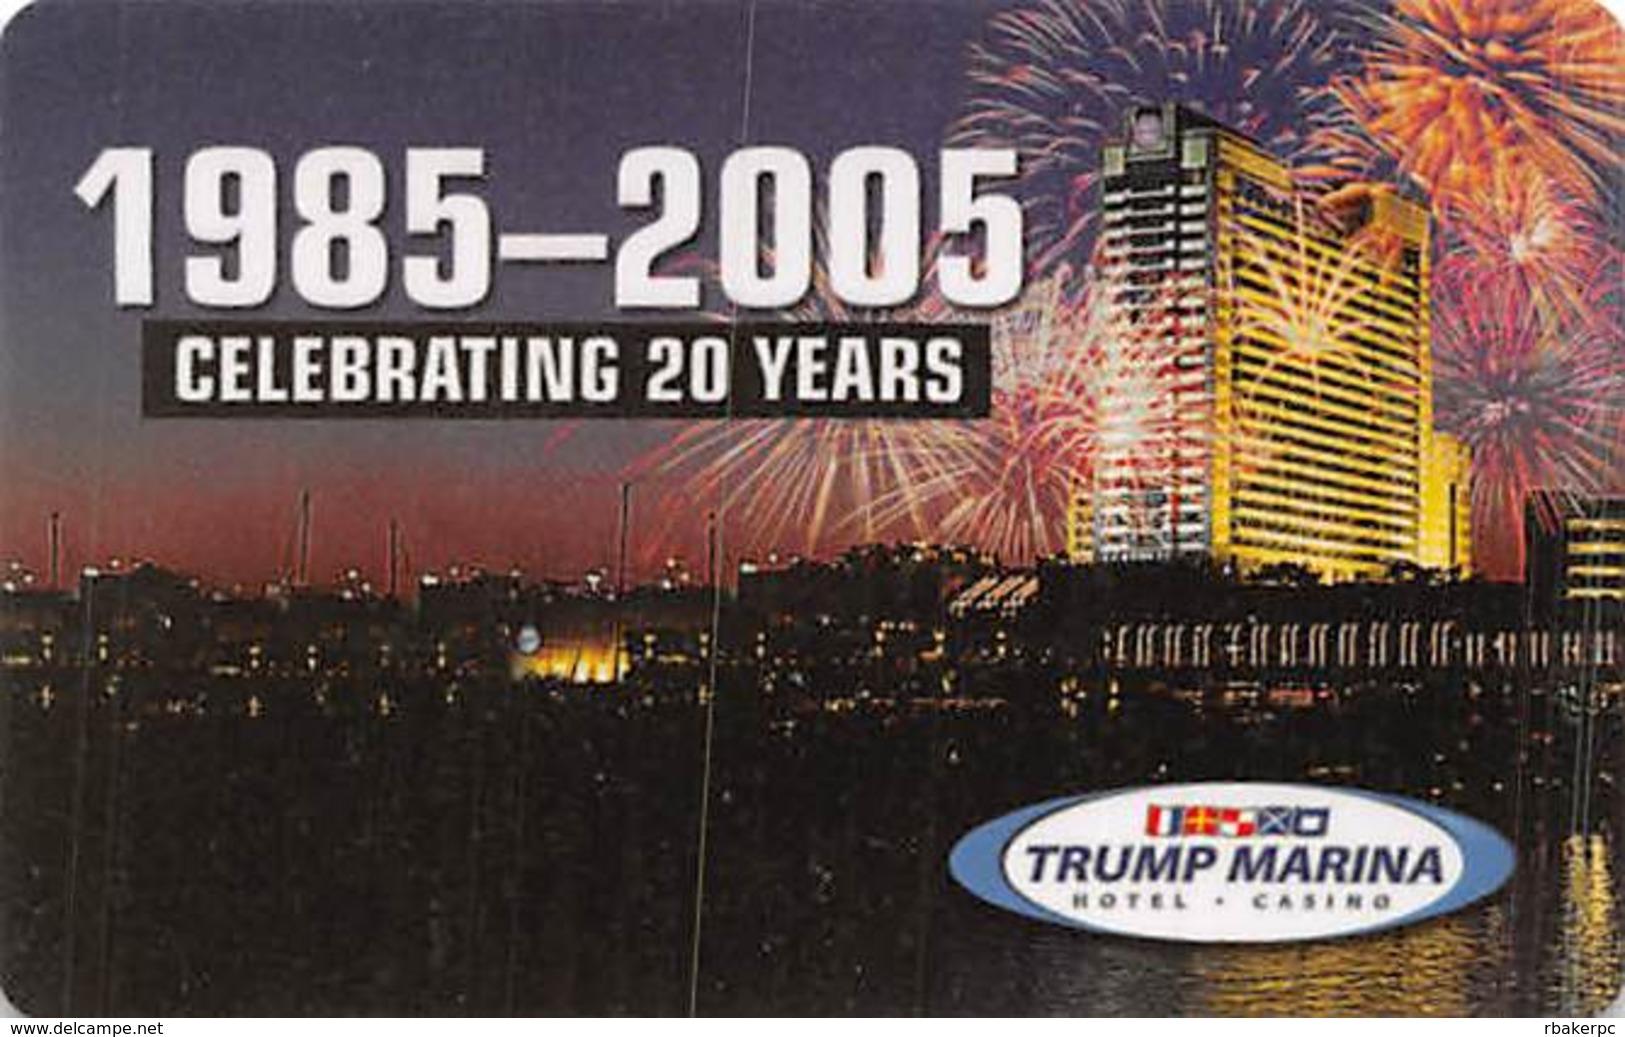 Trump Marina Casino Atlantic City NJ - BLANK Slot Card - Casinokaarten